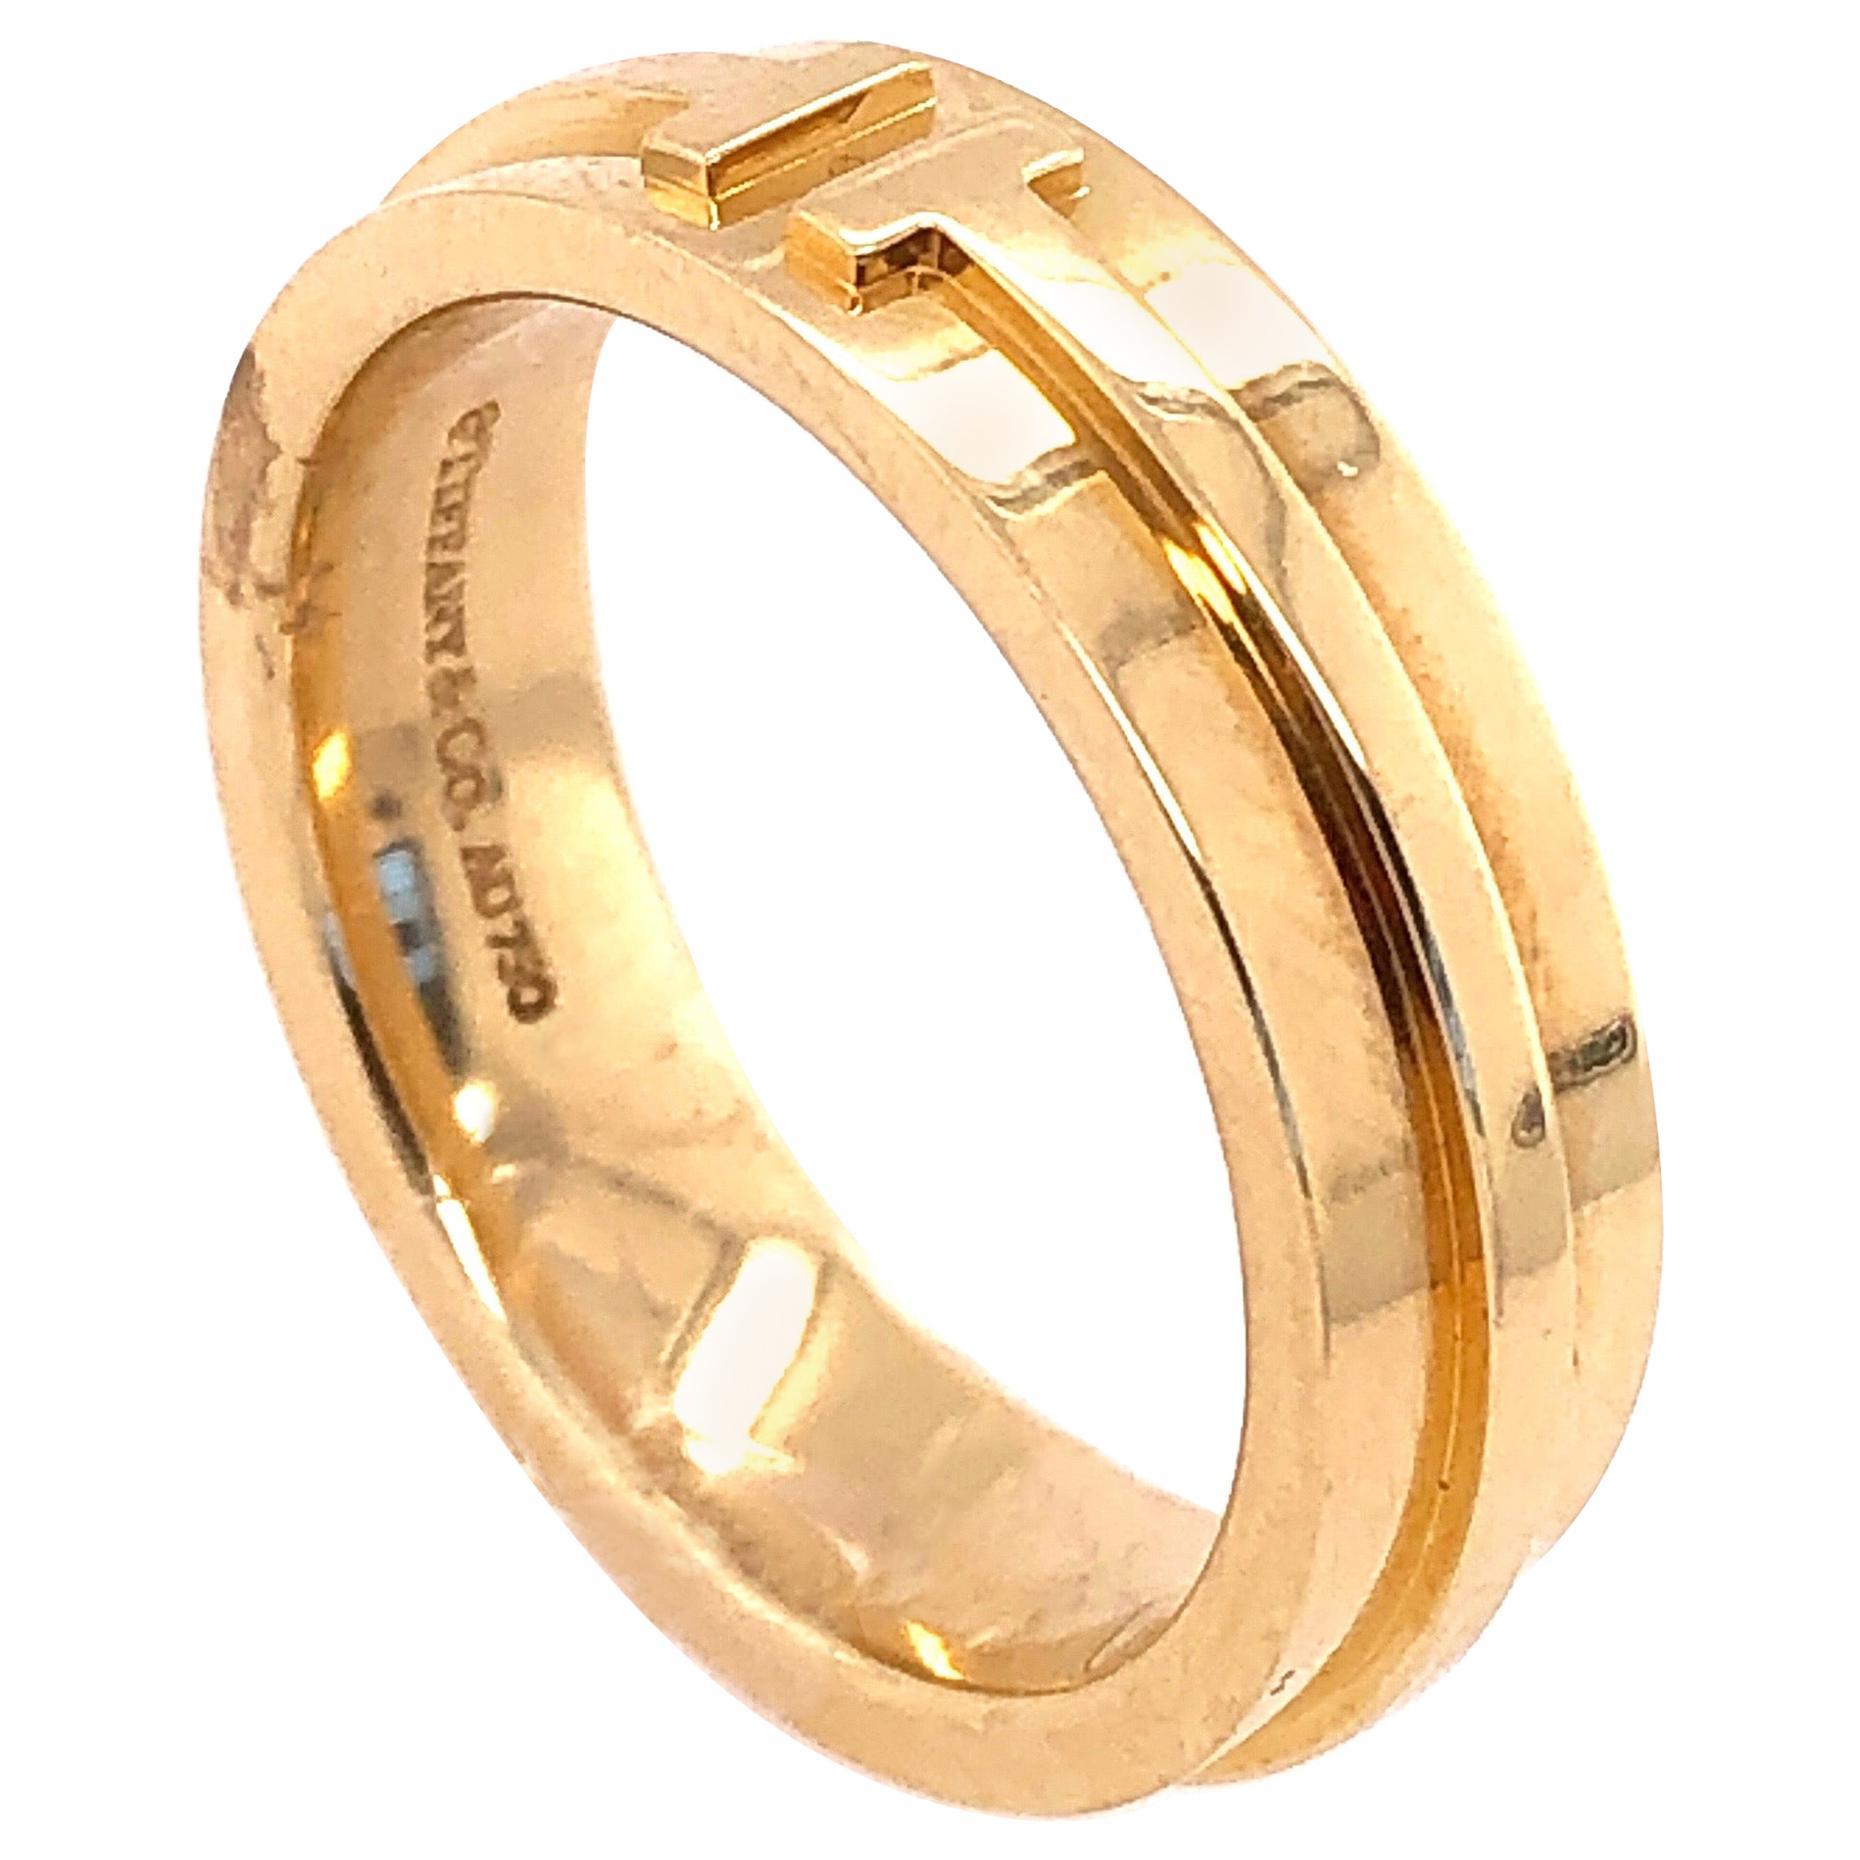 Tiffany & Co. 18 Karat Yellow Gold Wedding Ring / Band